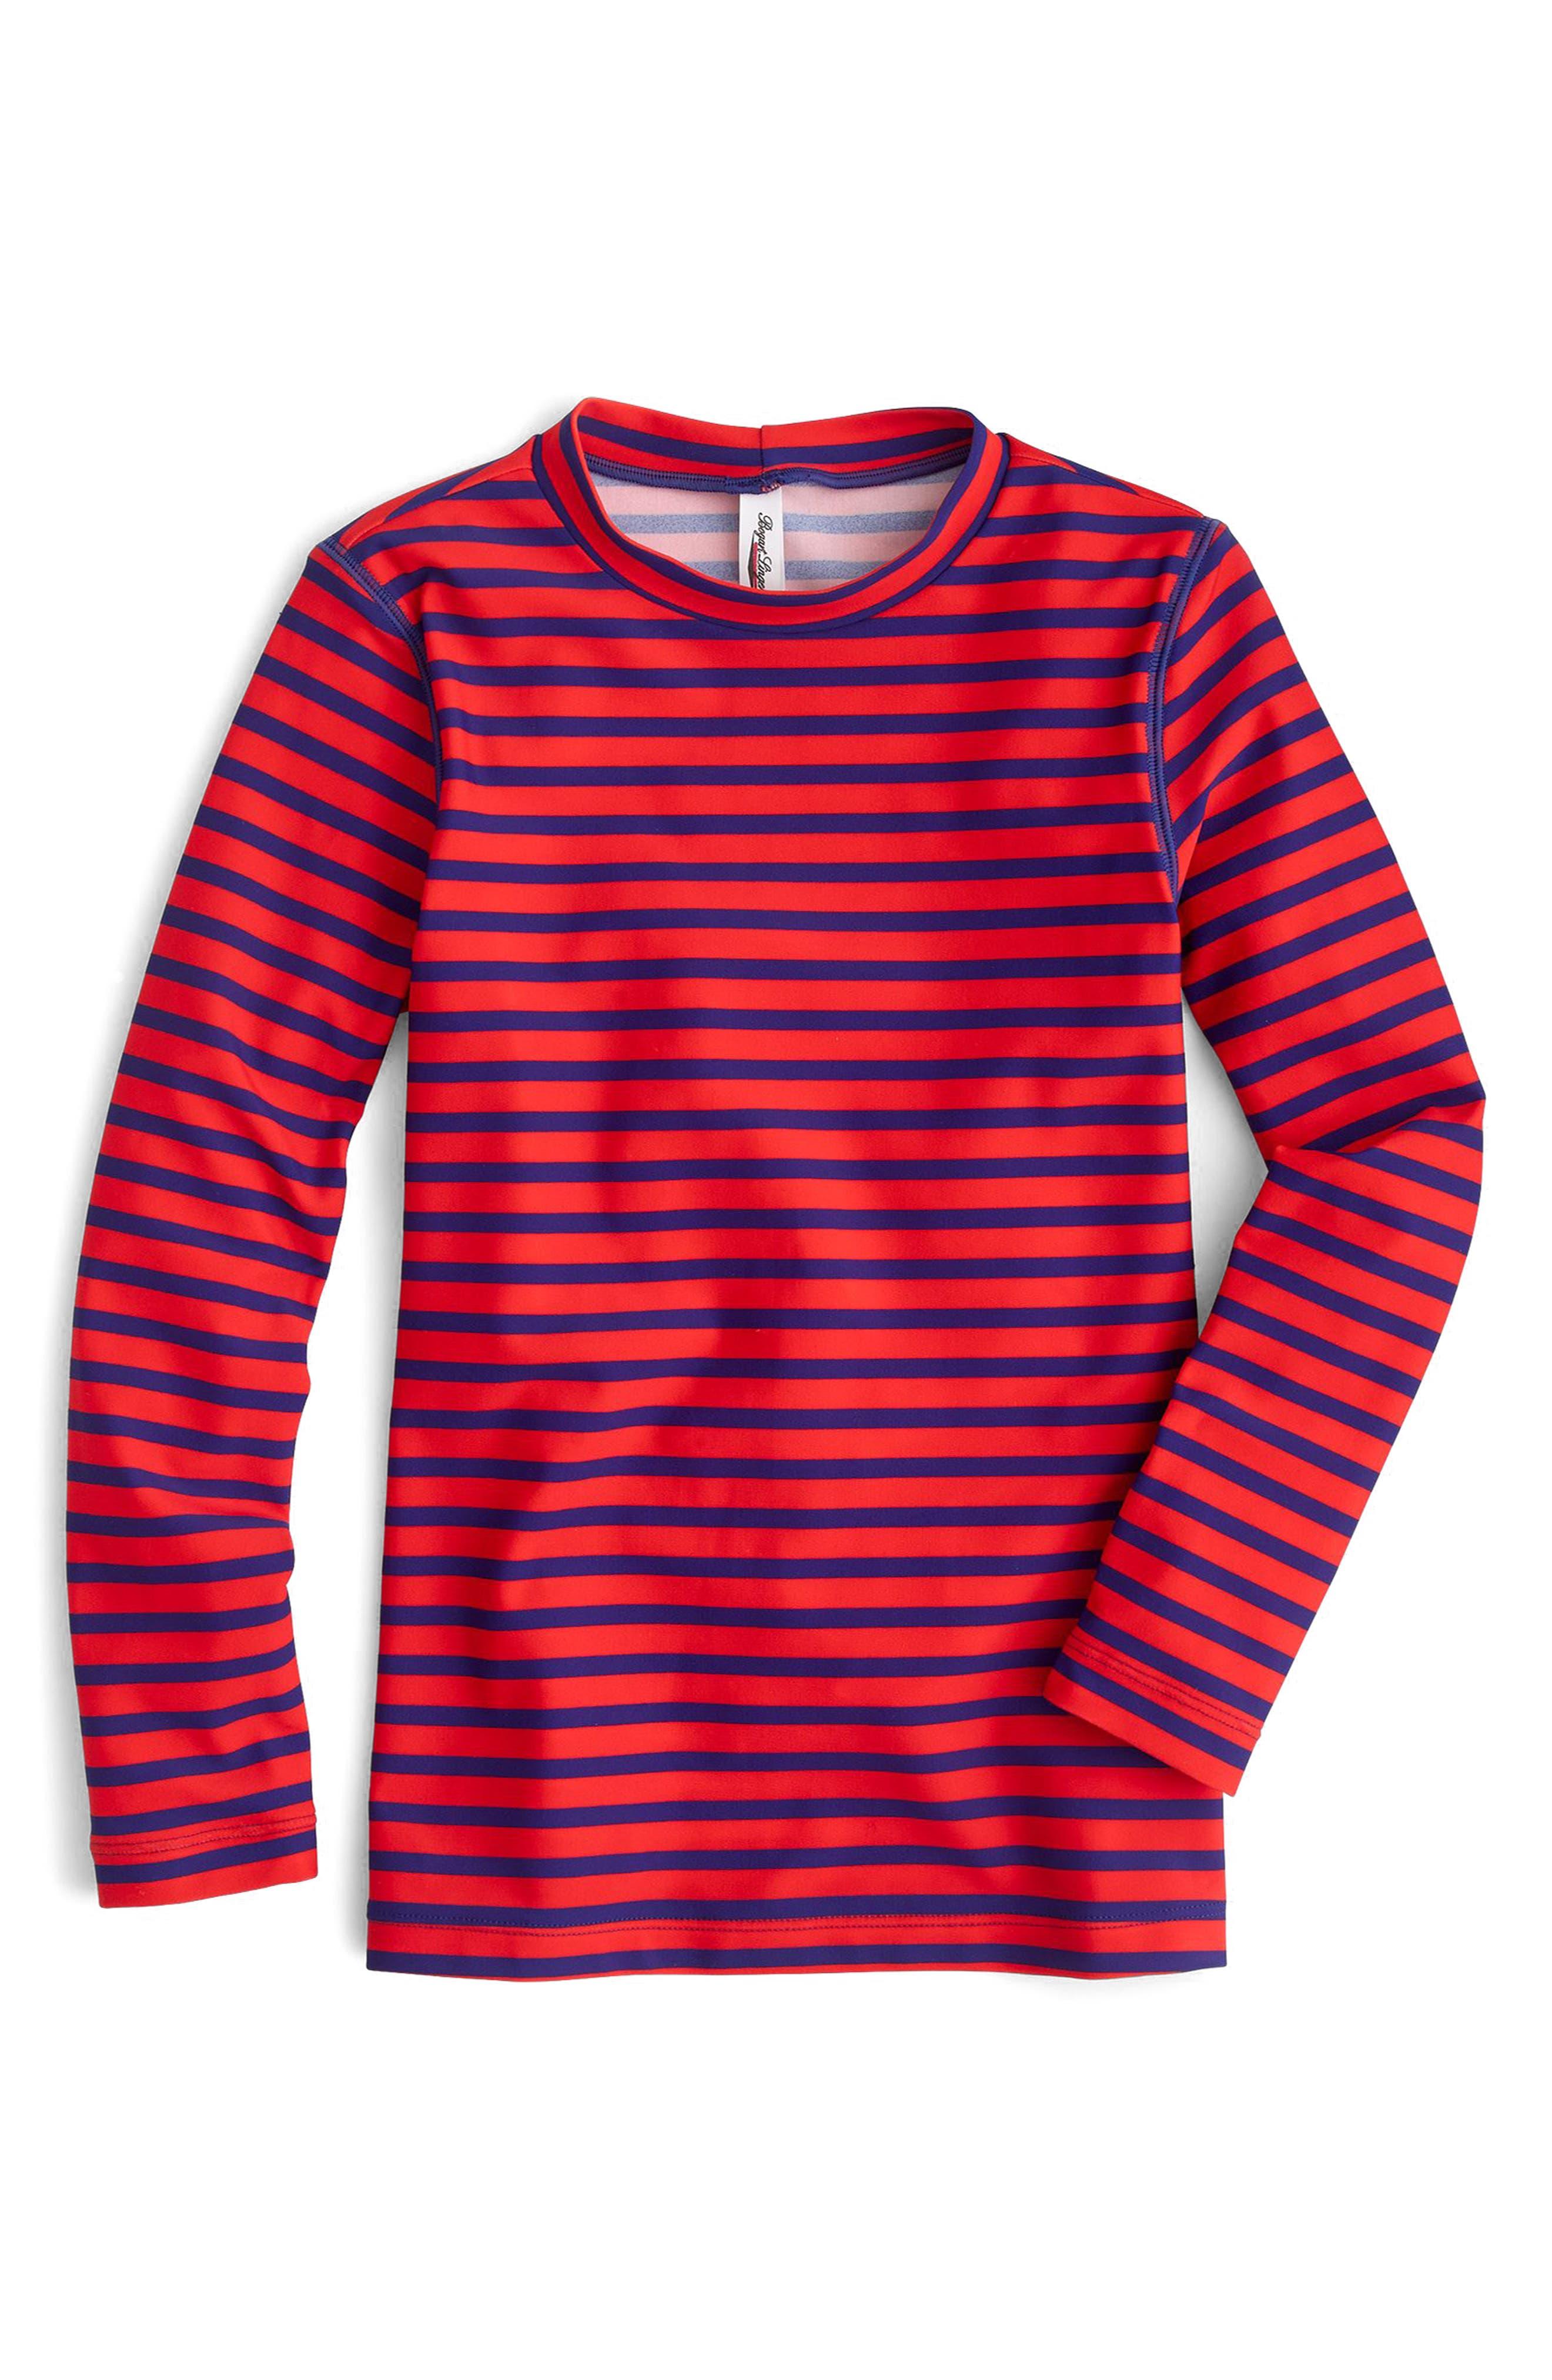 Stripe Long Sleeve Rashguard,                         Main,                         color,